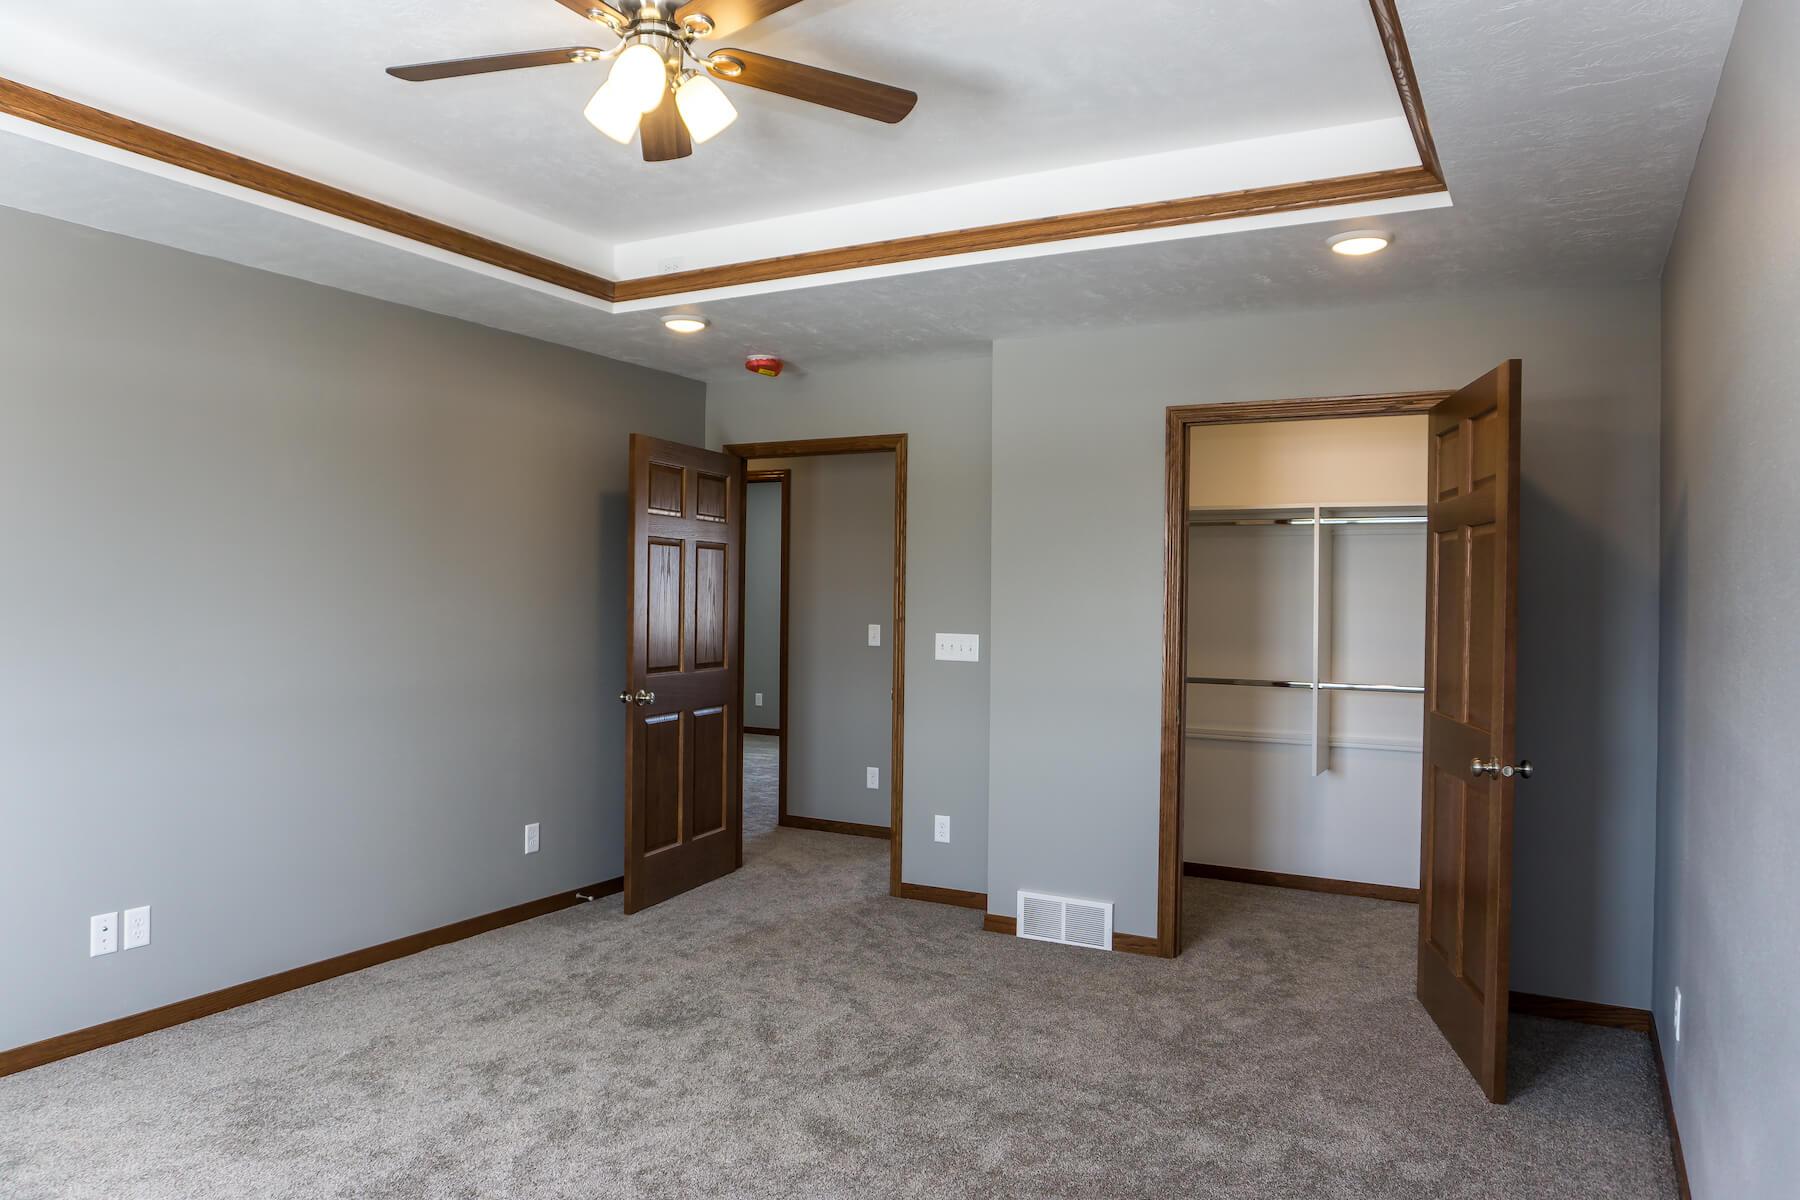 2019-4-12 Kemper Avenue Builders FirstSource Compressed  26.jpg